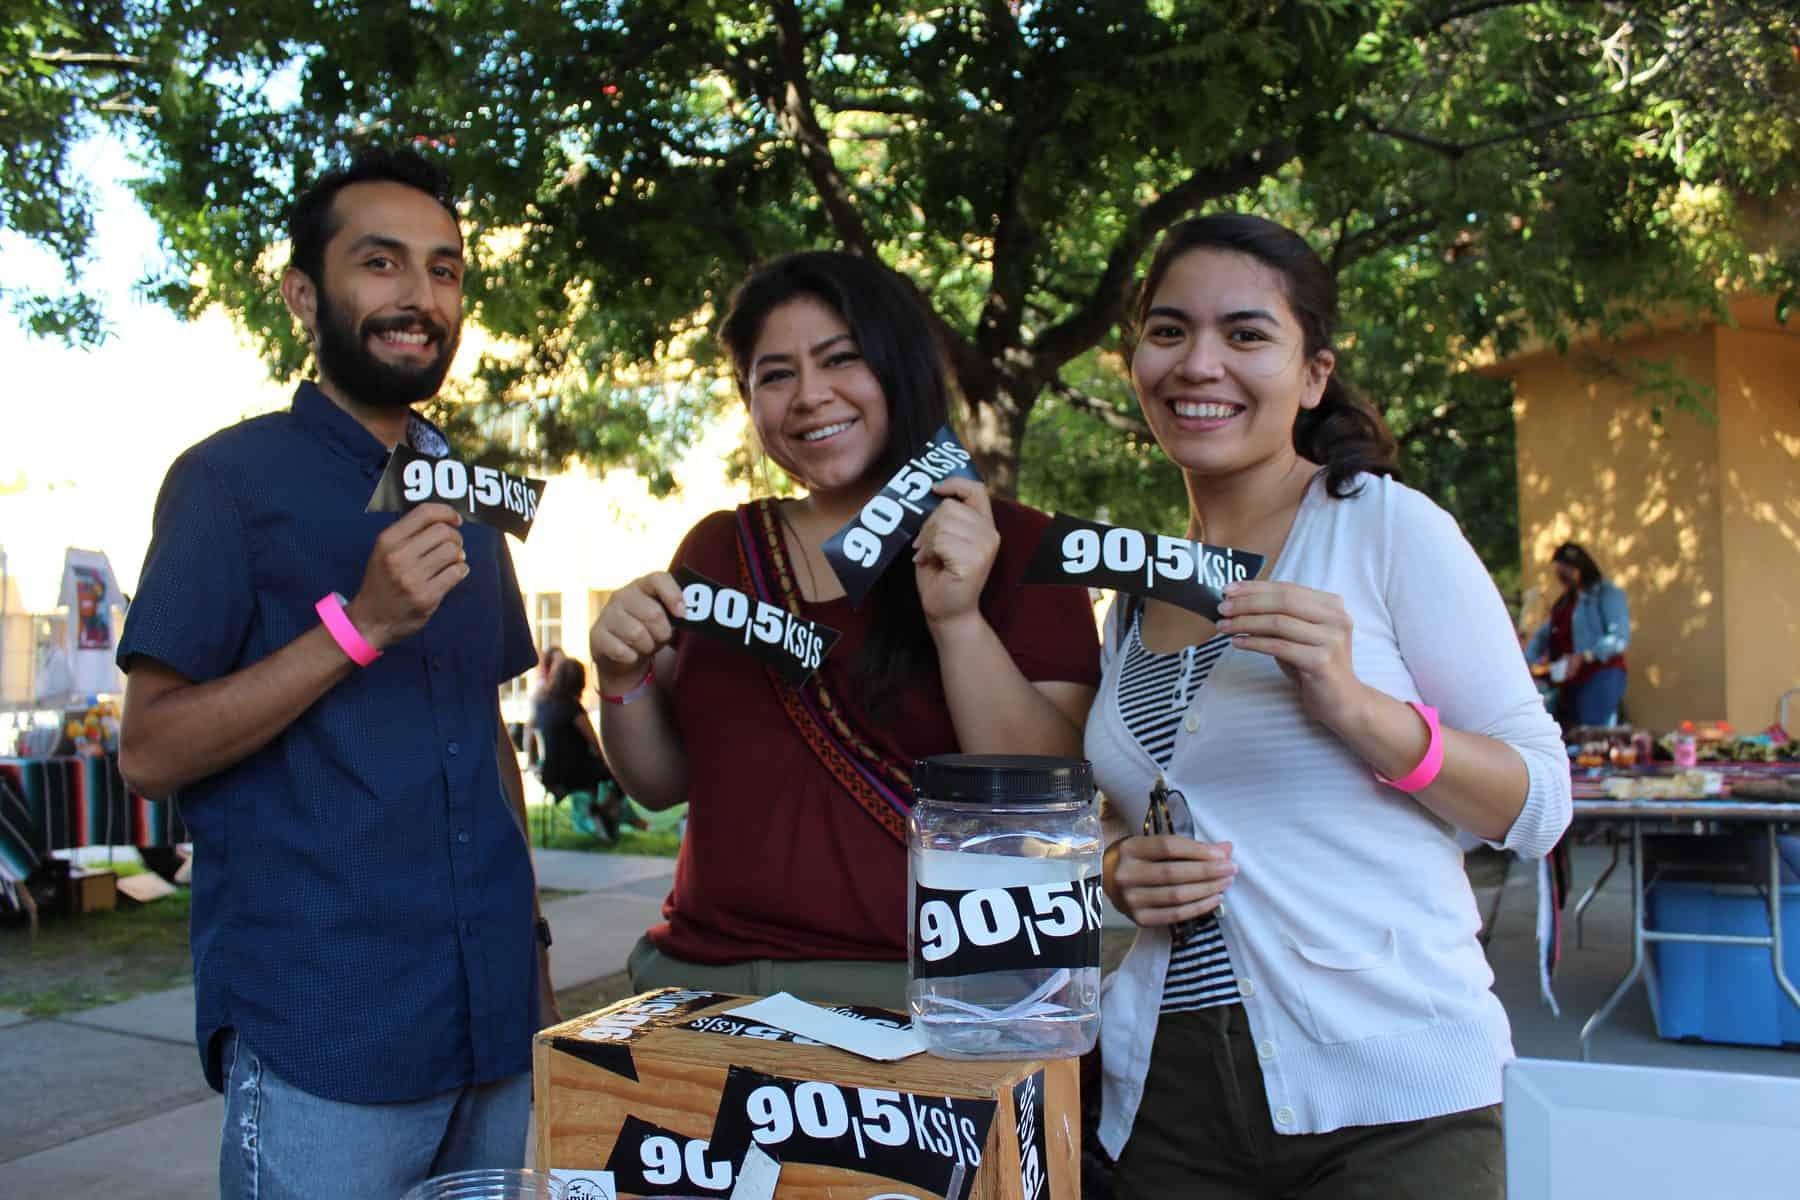 Three Community Members Holding Ksjs Stickers